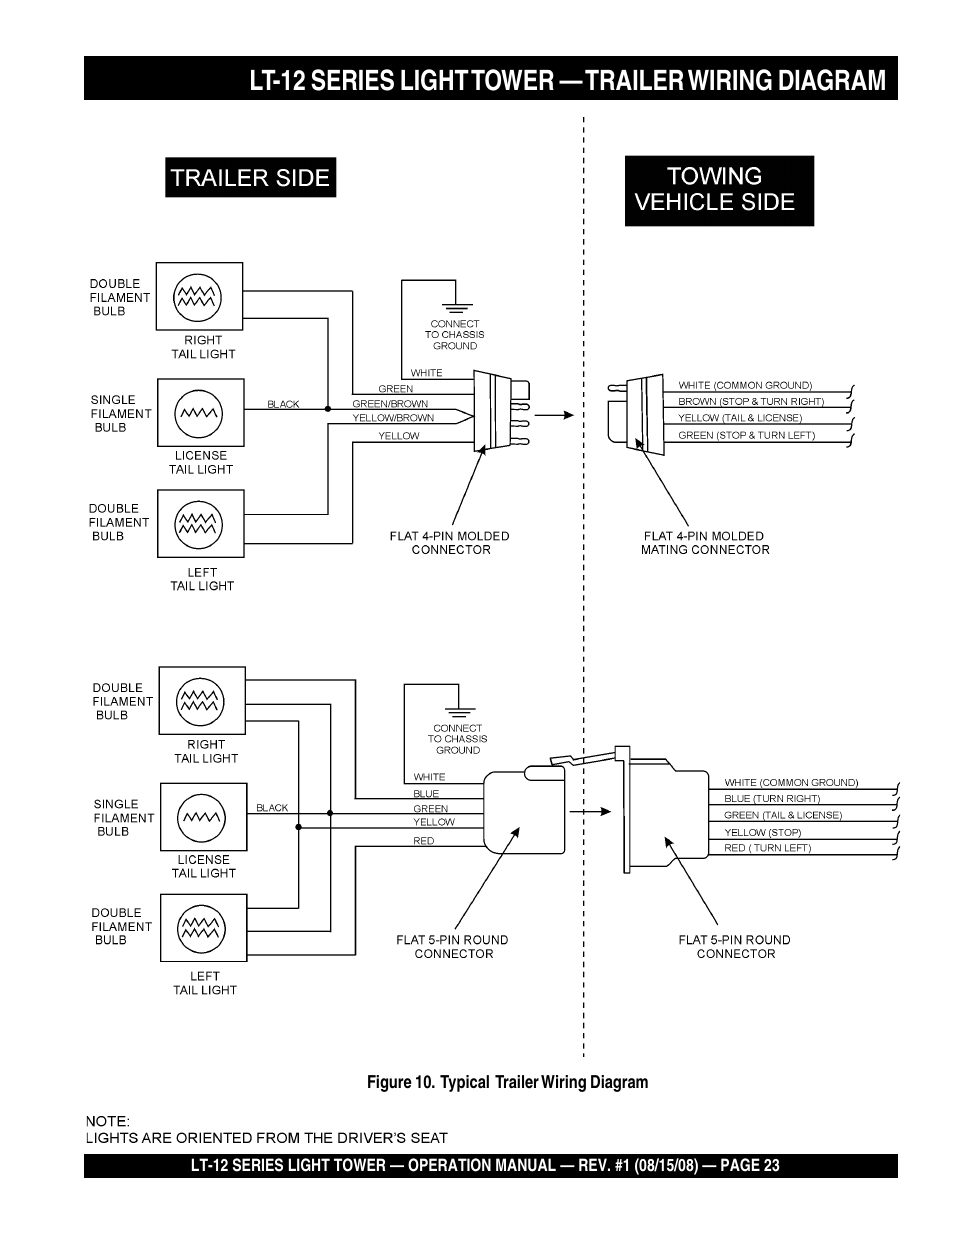 medium resolution of lt 12 series light tower trailer wiring diagram stow nighthawk light and outlet wiring diagrams light tower wiring diagram